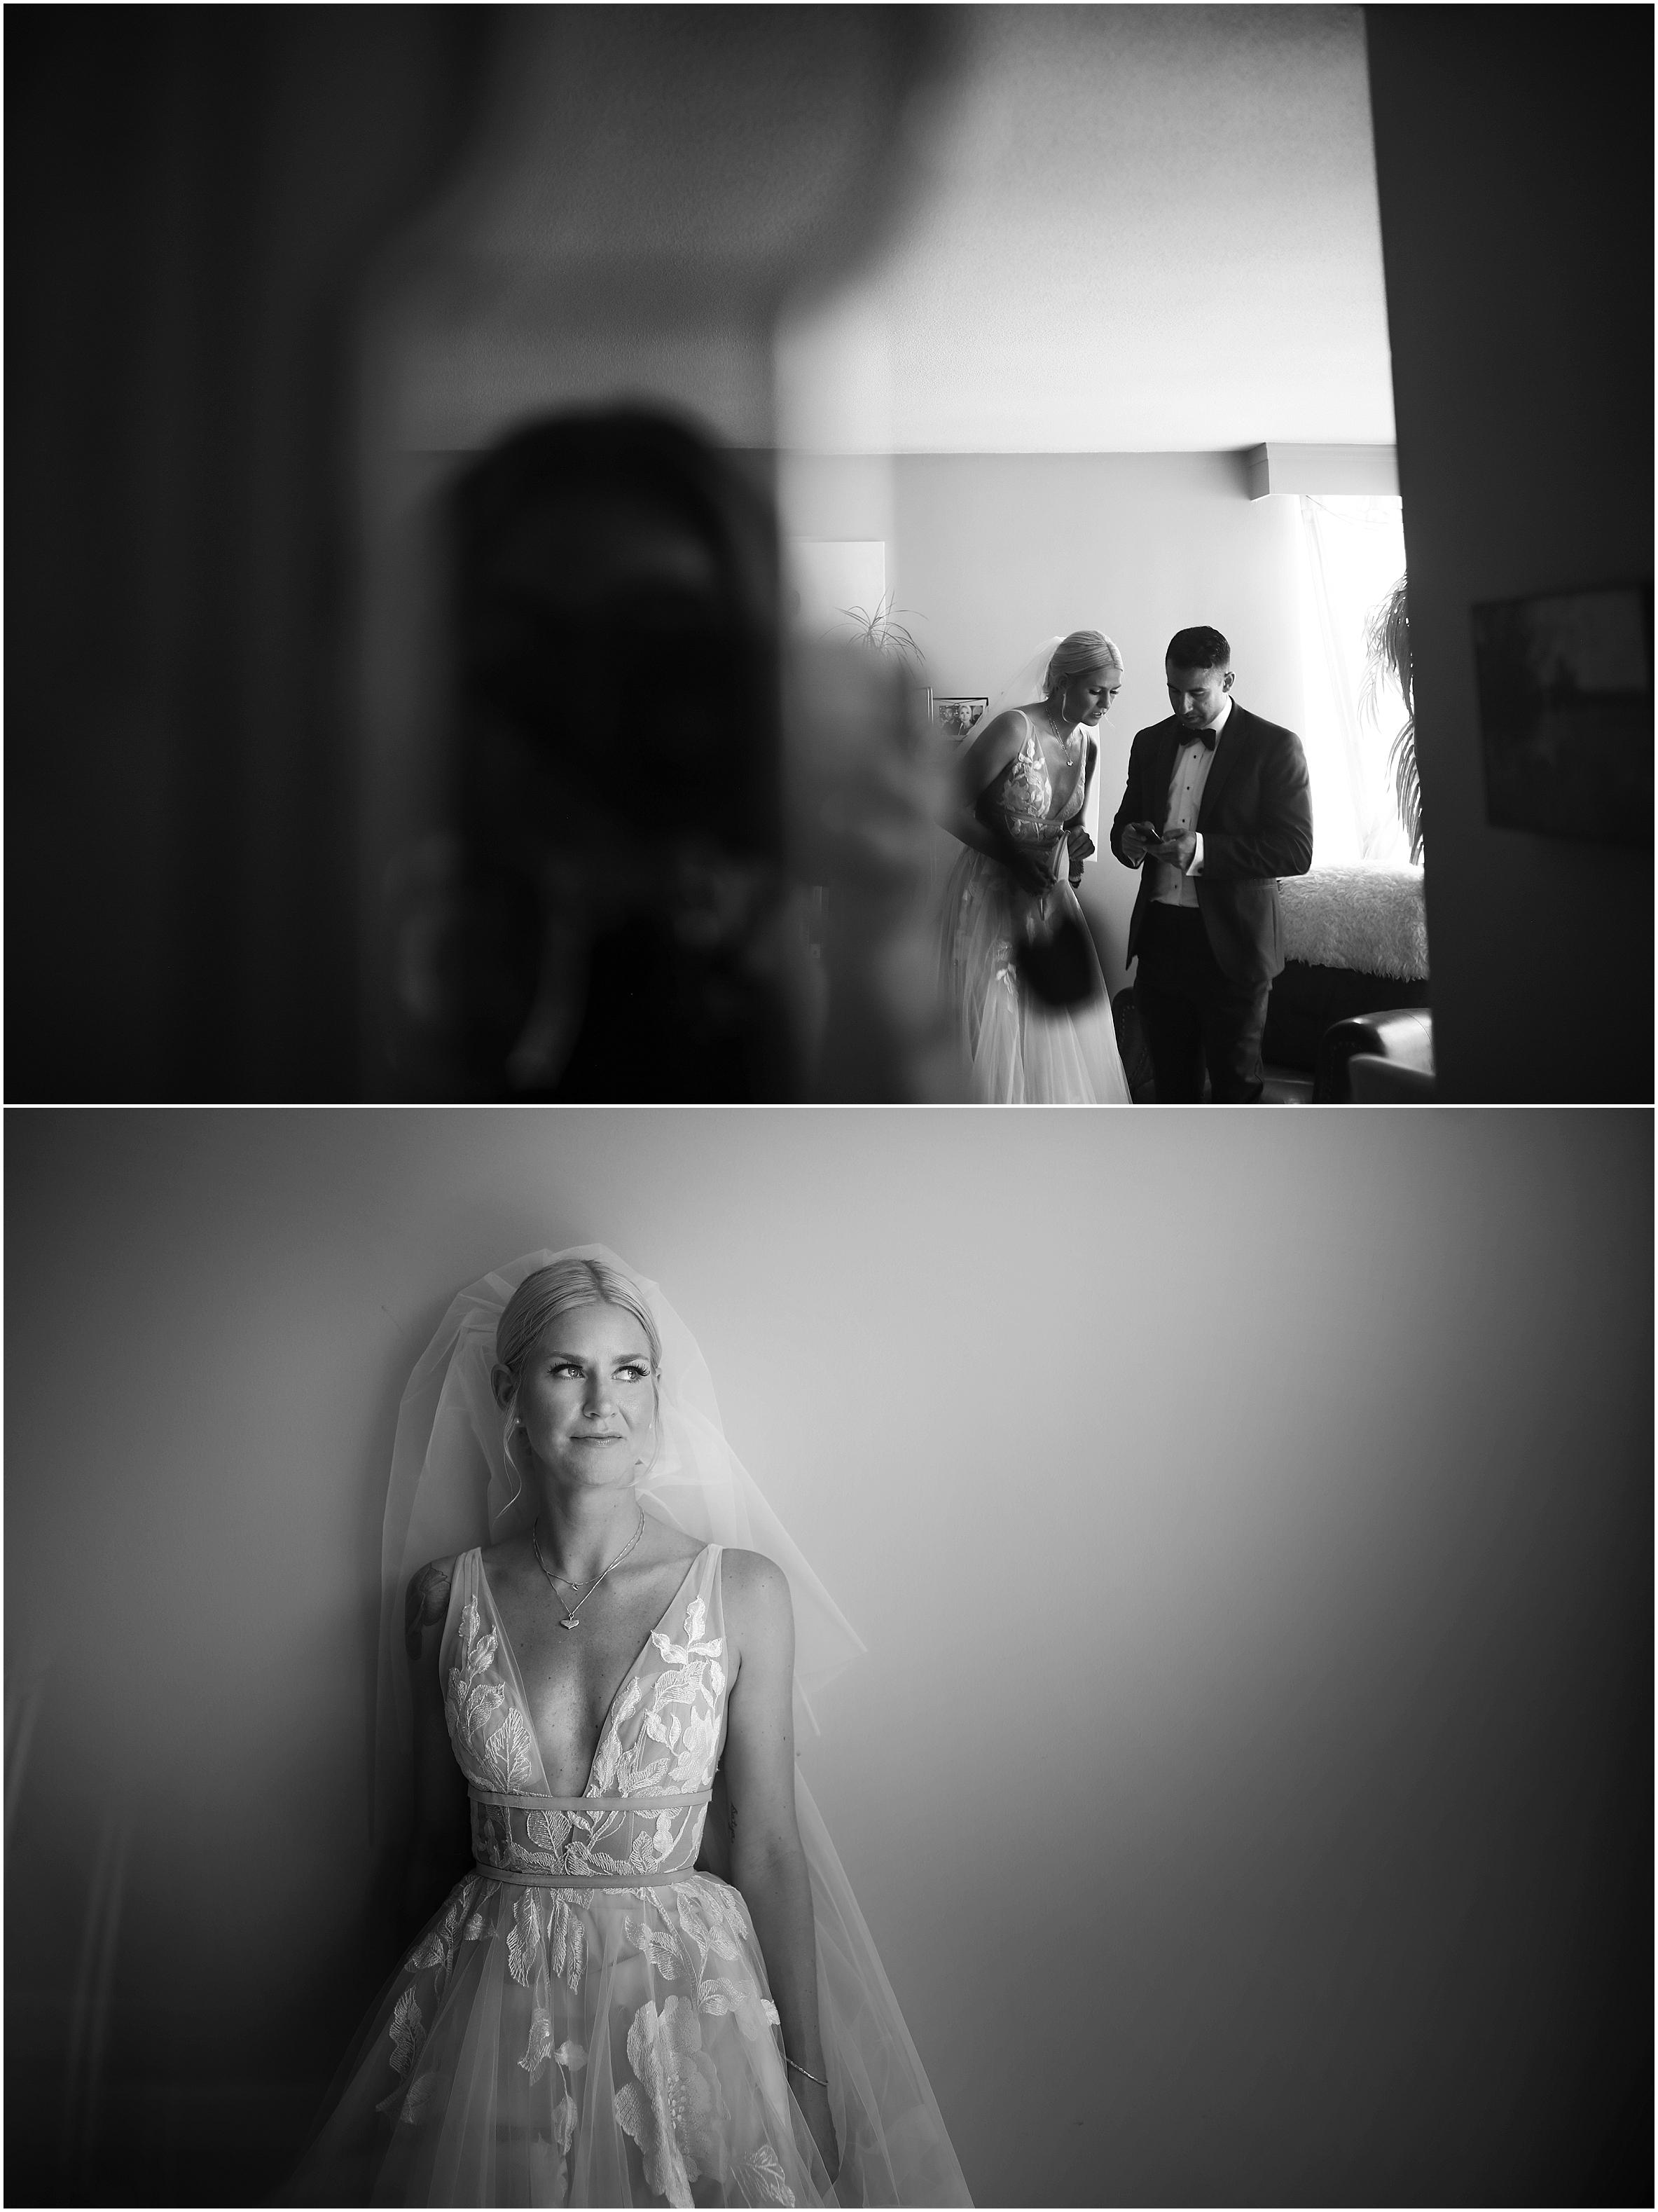 vancouver-wedding-photographer-the-loft-earls-yaletown_0006.jpg